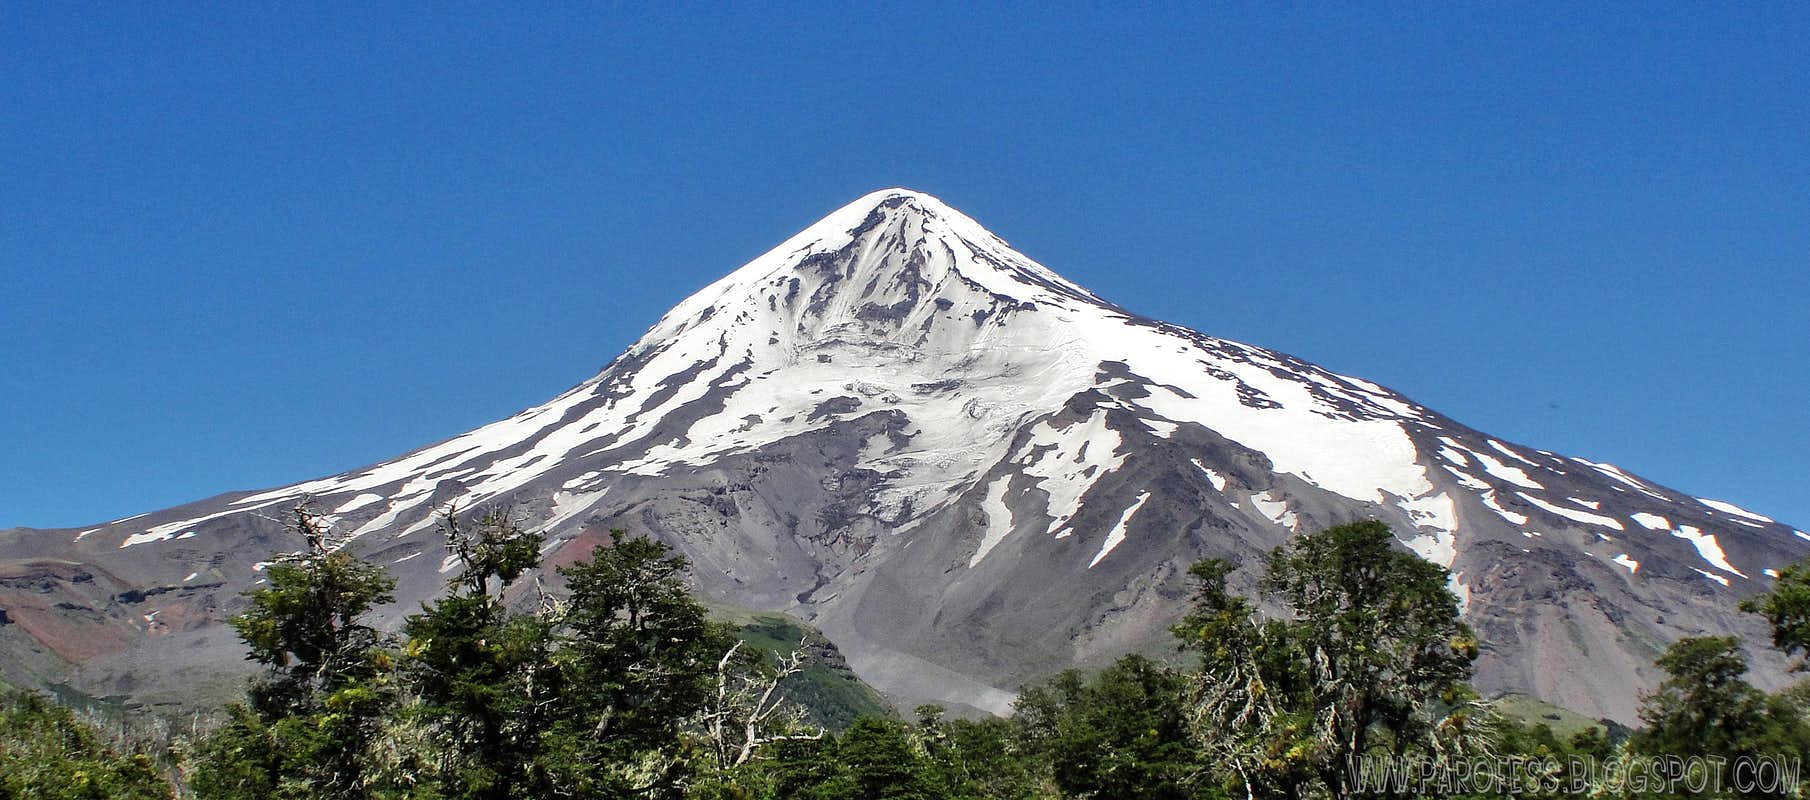 Lanin volcano : Climbing, Hiking & Mountaineering : SummitPost